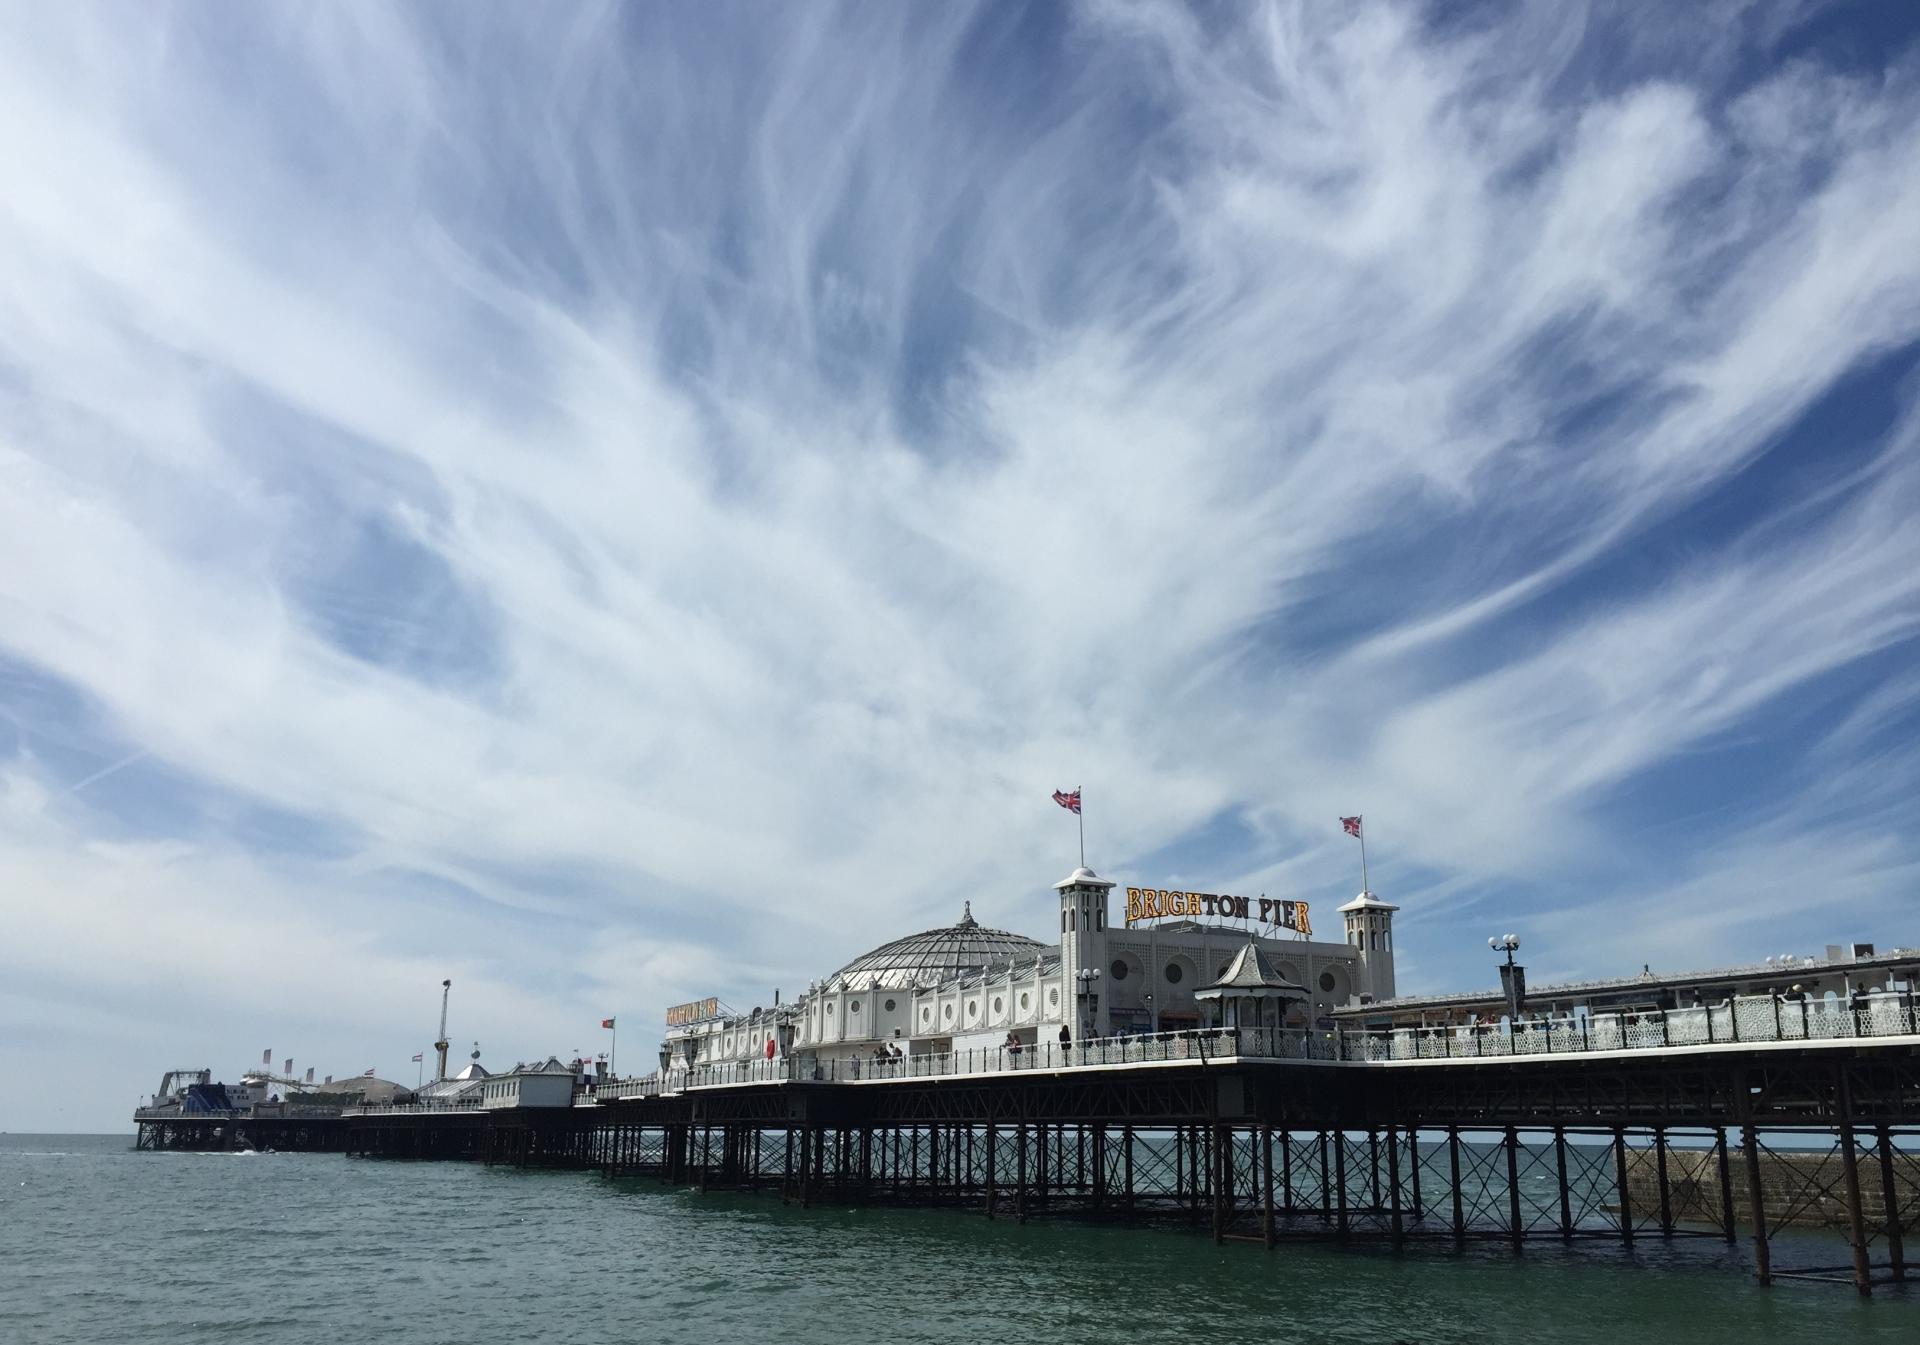 Sky over Brighton Pier